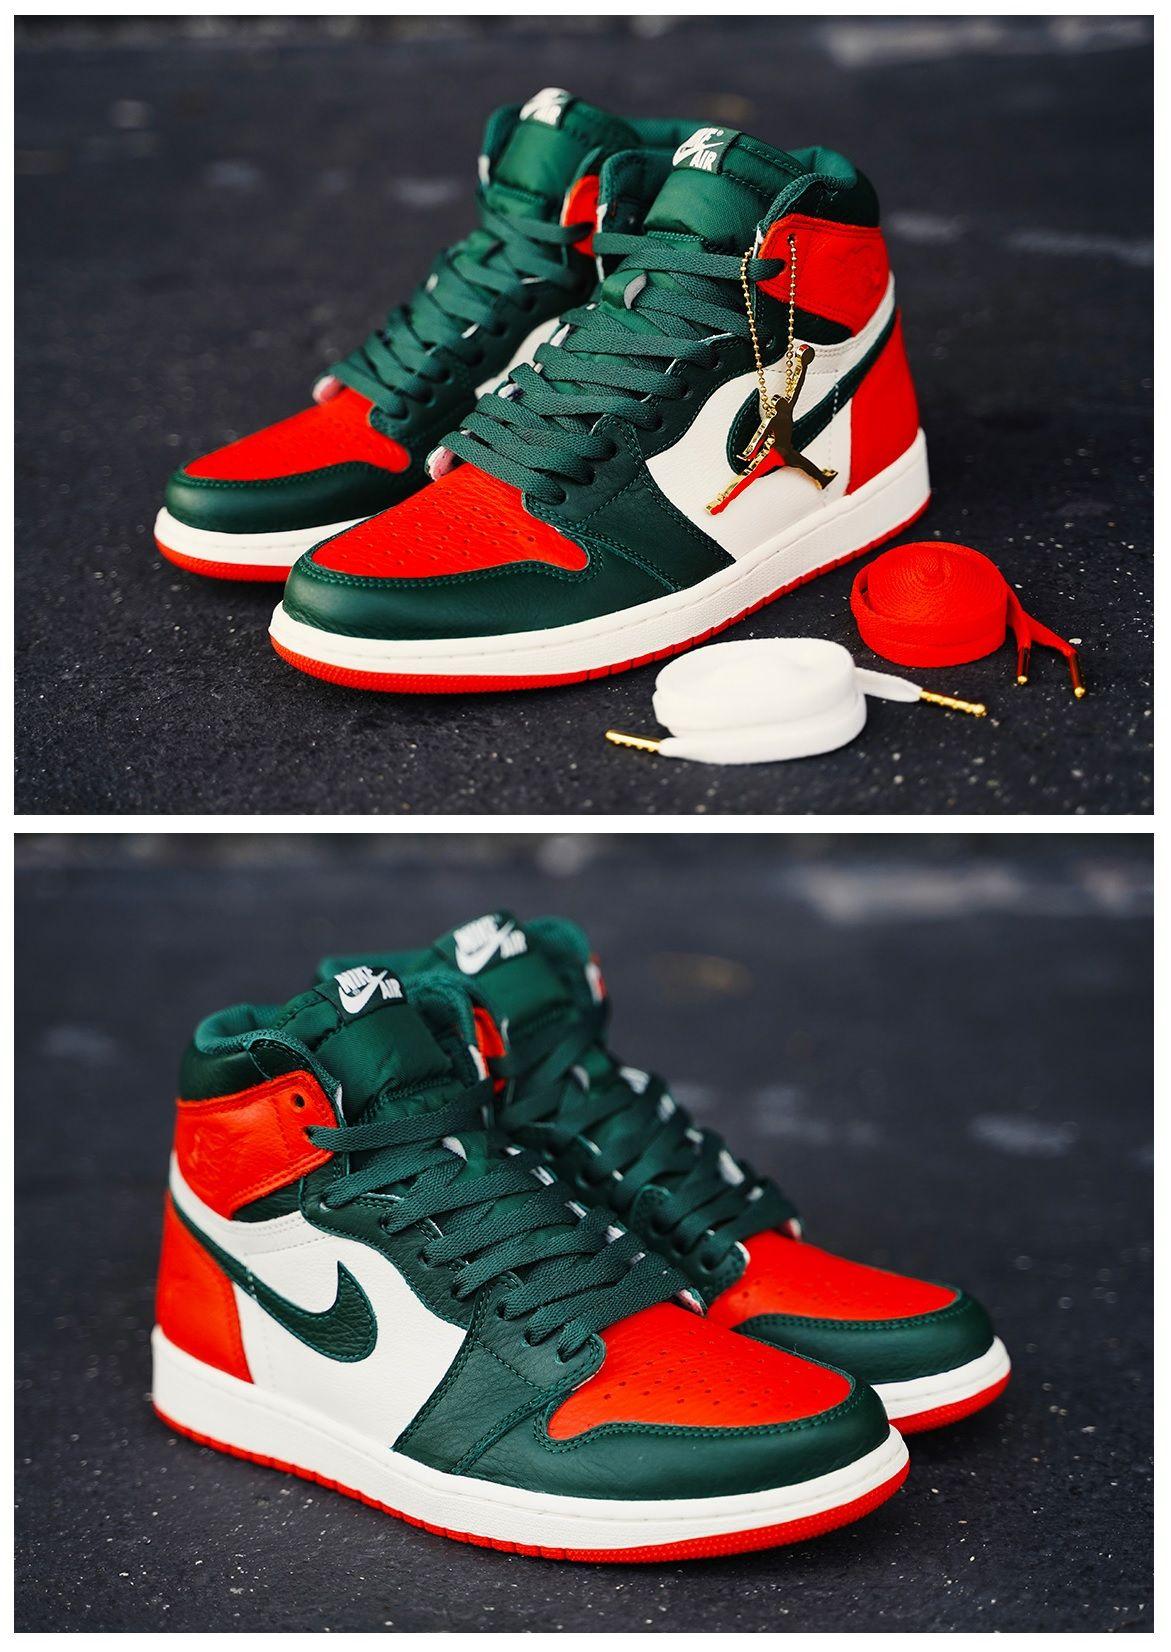 38049bf87ebc SoleFly x Nike Air Jordan 1